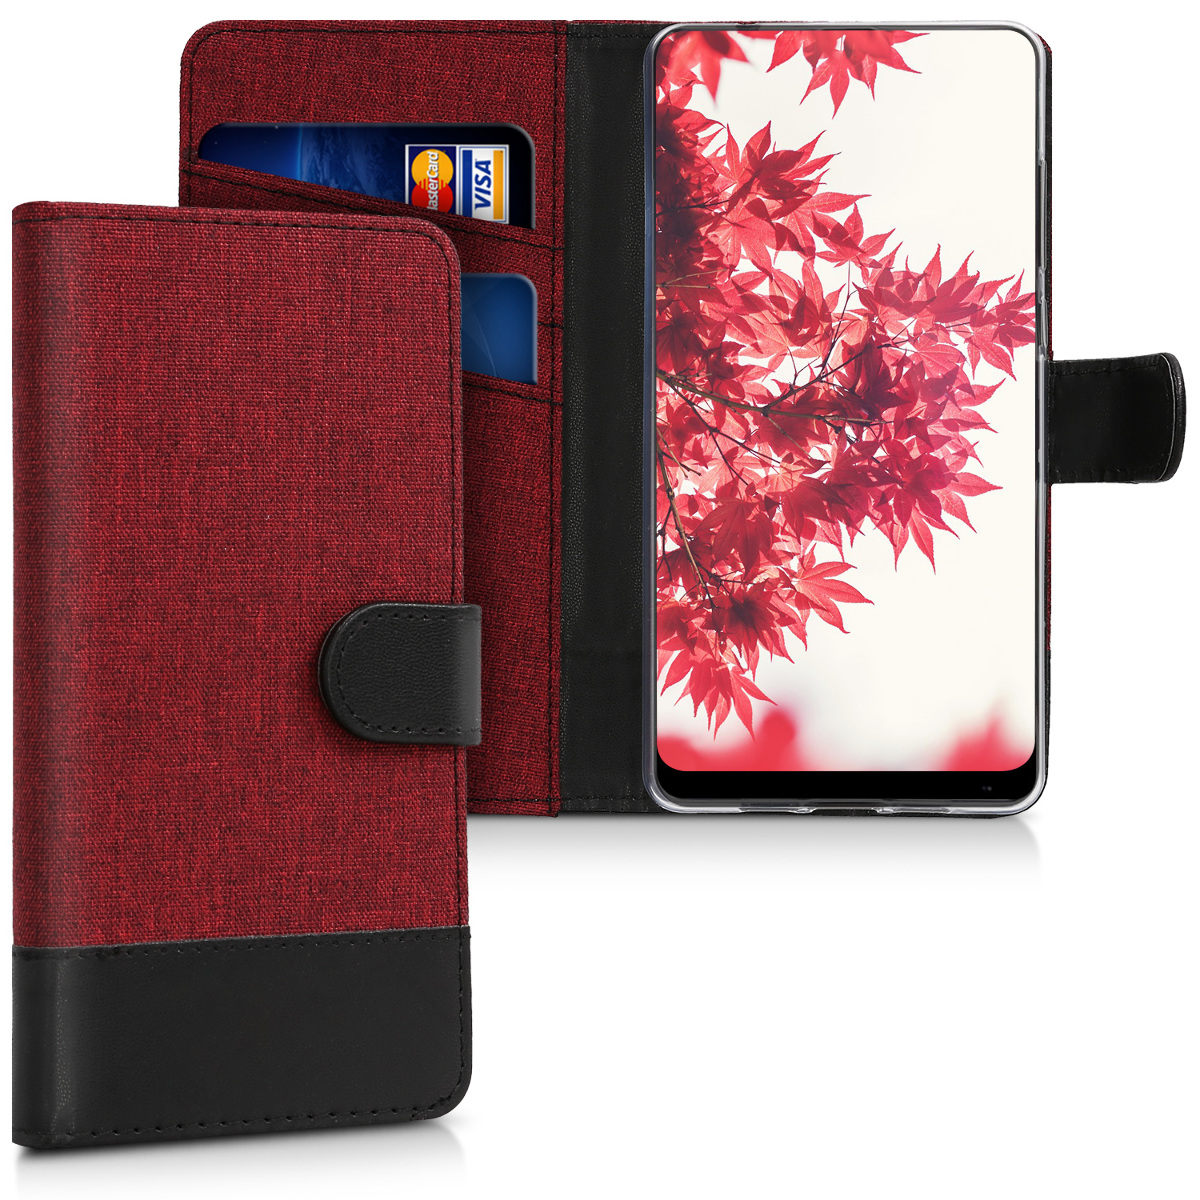 KW Θήκη-Πορτοφόλι Xiaomi Mi Mix 2 - Dark Red / Black Canvas (43505.20)